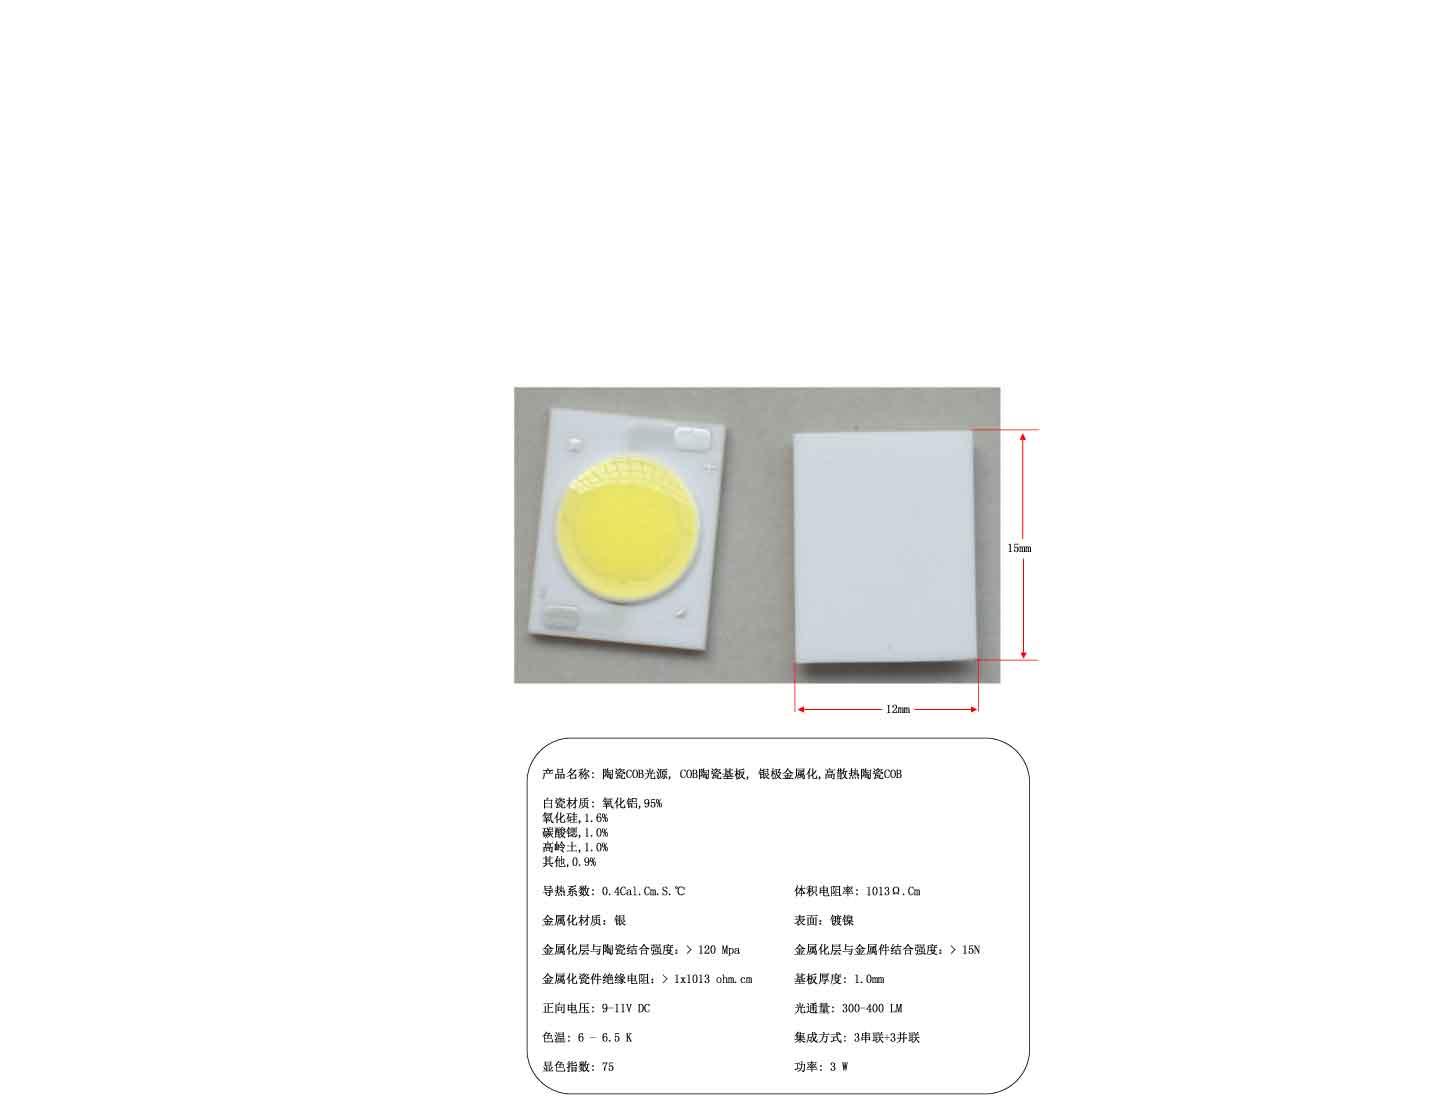 3W ceramic COB light source, COB ceramic substrate, silver electrode metallization, 15x12x1 high heat dissipation ceramic COB